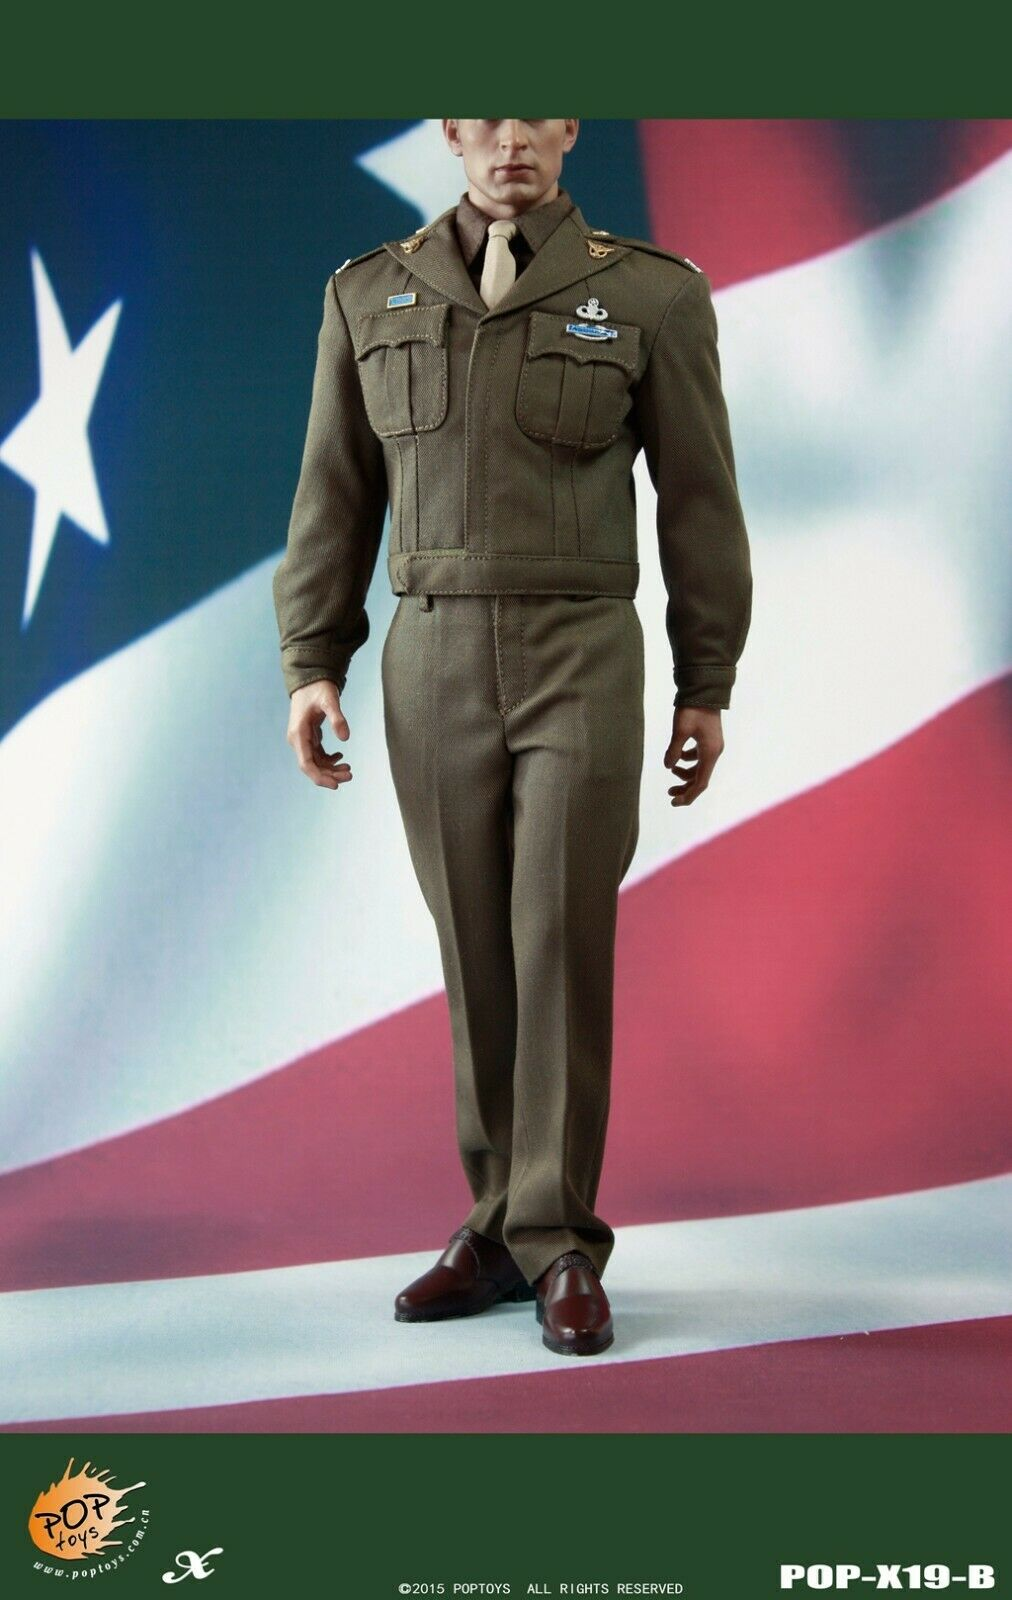 POPgiocattoli X19 WWII oroEN AGE US Army Officer CAPTAIN Uniform B 16